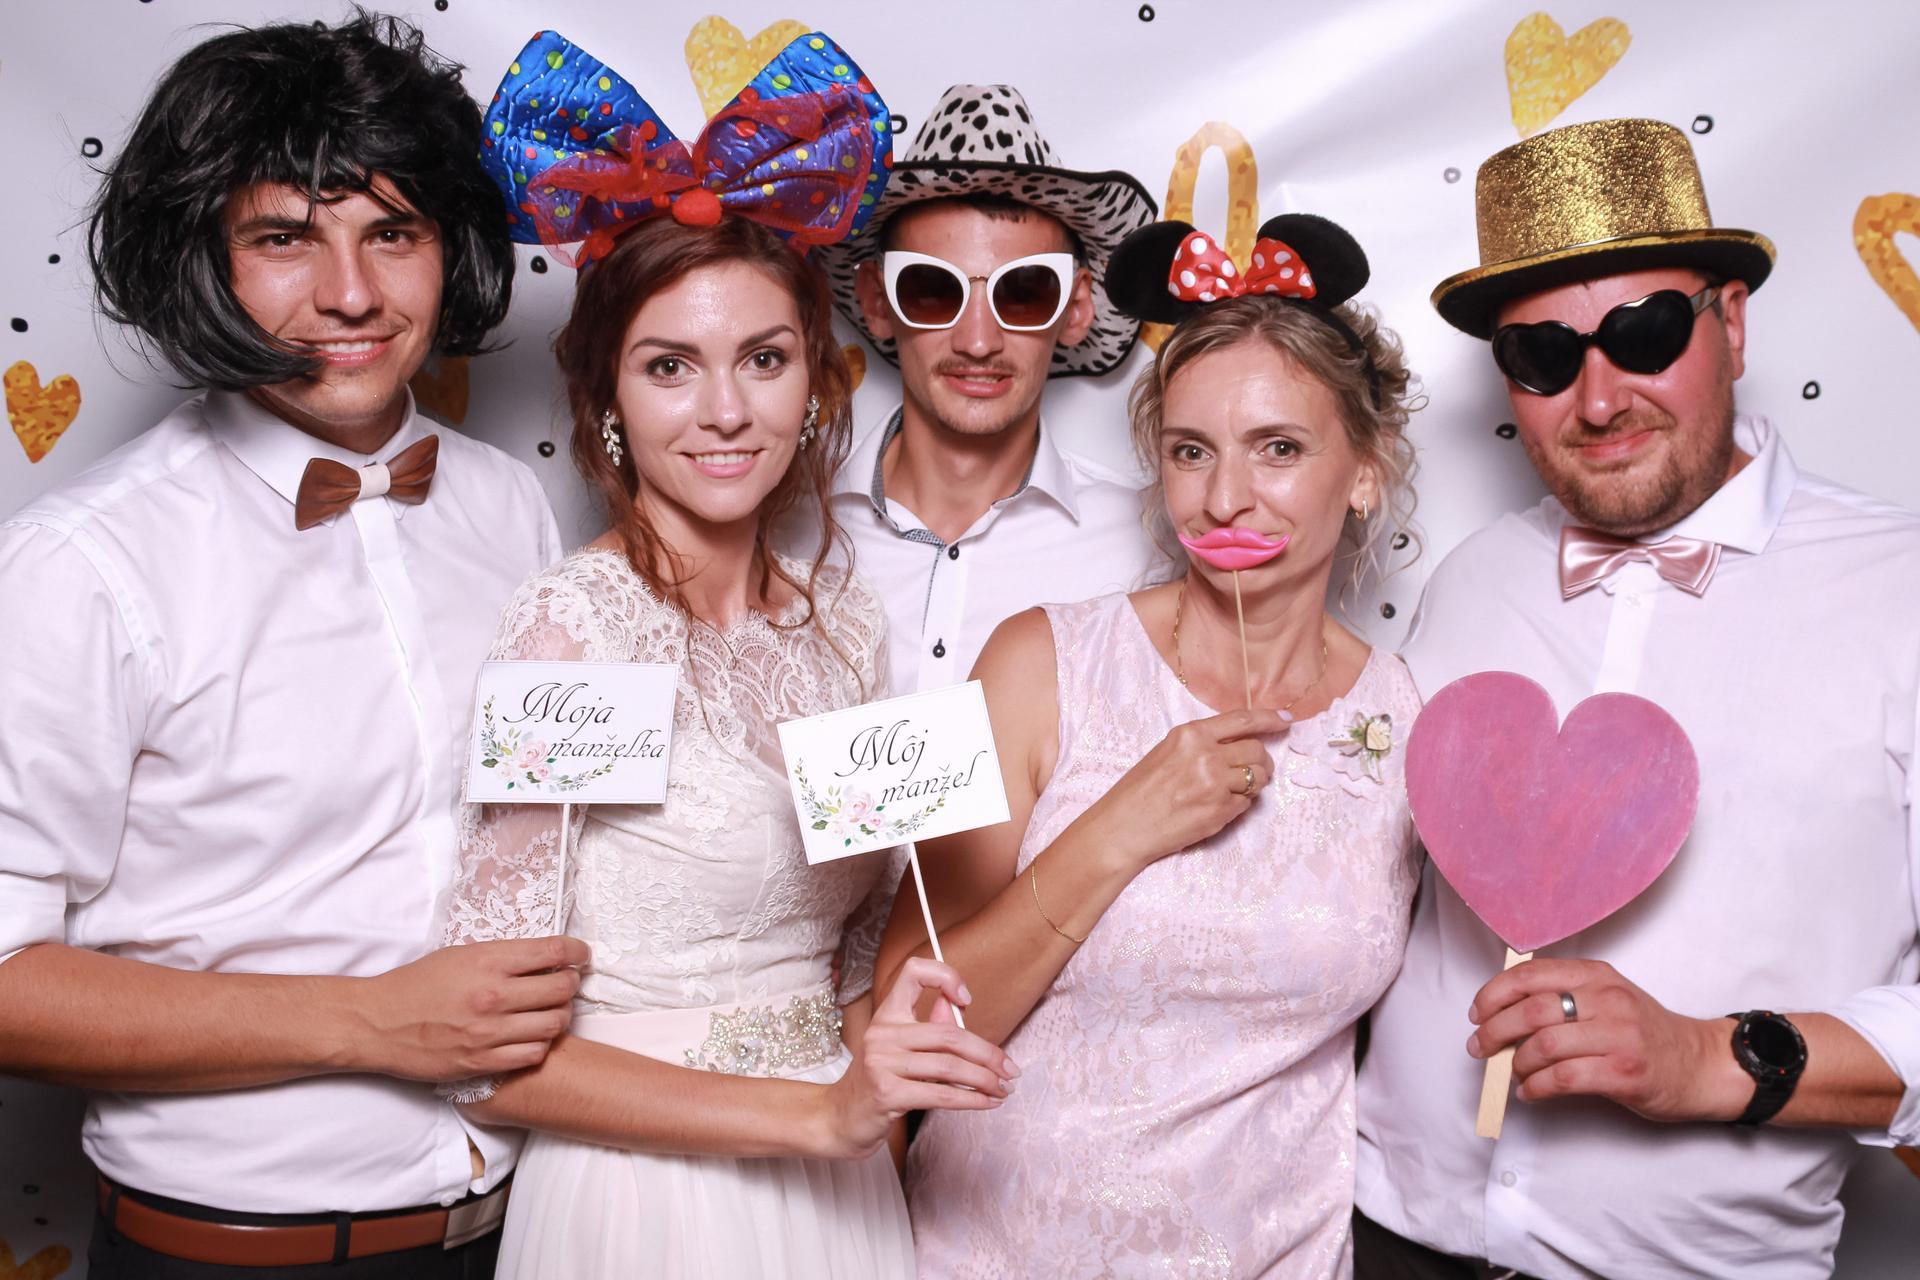 Wedding Time - fotokútik od Funrider mal mega úspech :)